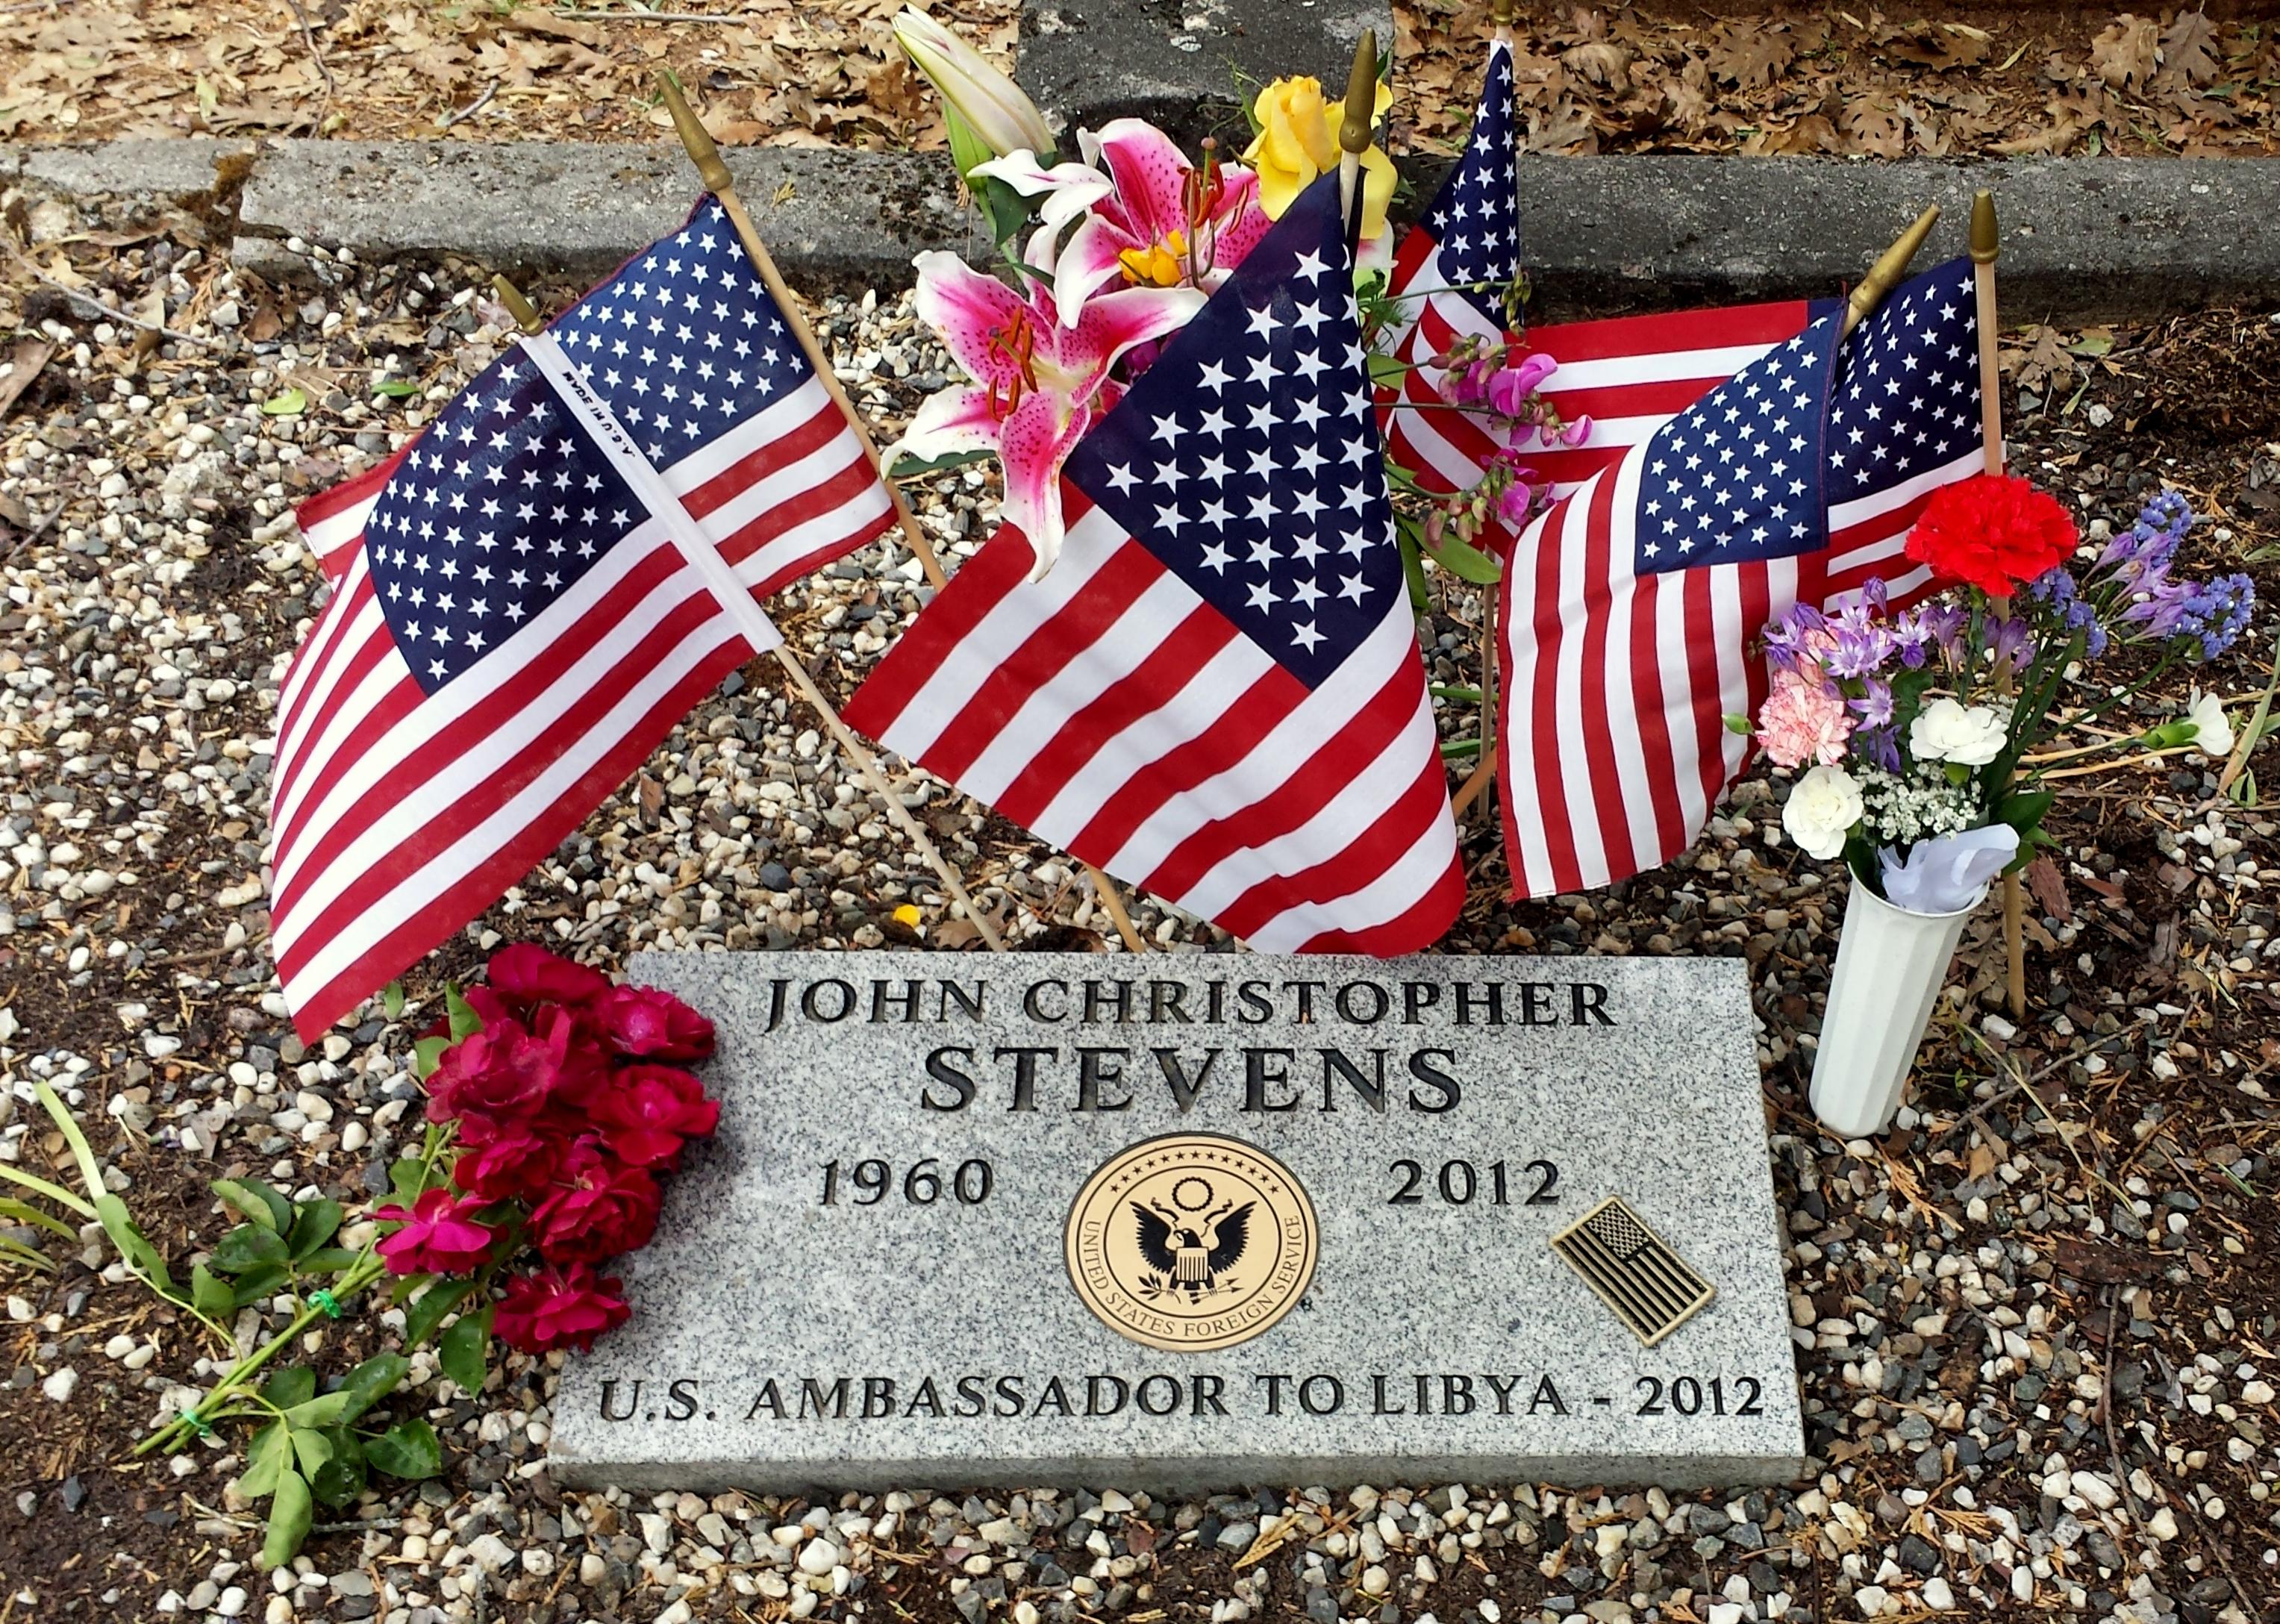 ambassador_j-_christopher_stevens_grave